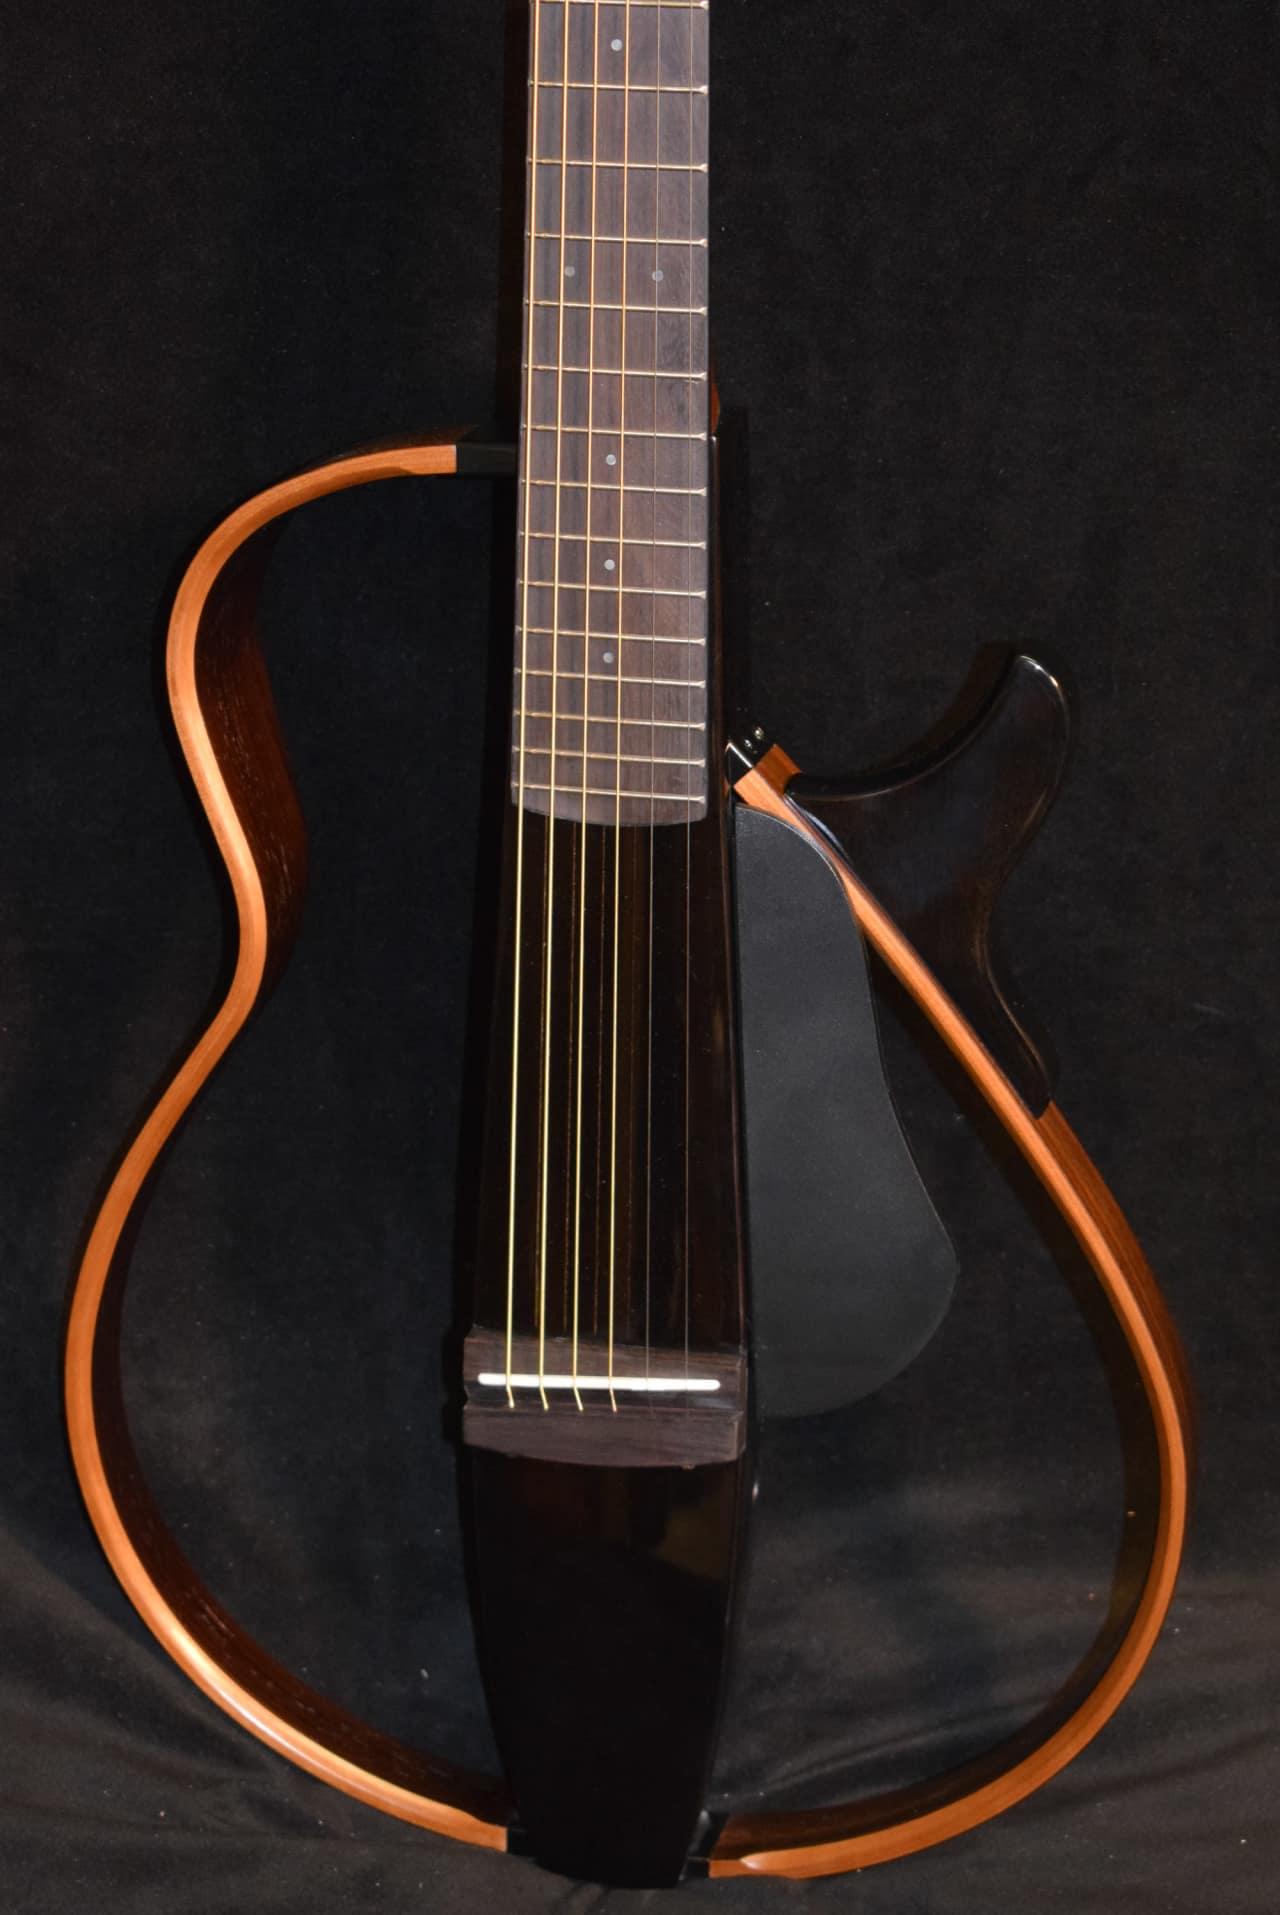 Yamaha slg200s tbl steel string silent guitar trans black for Yamaha slg200s steel string silent guitar